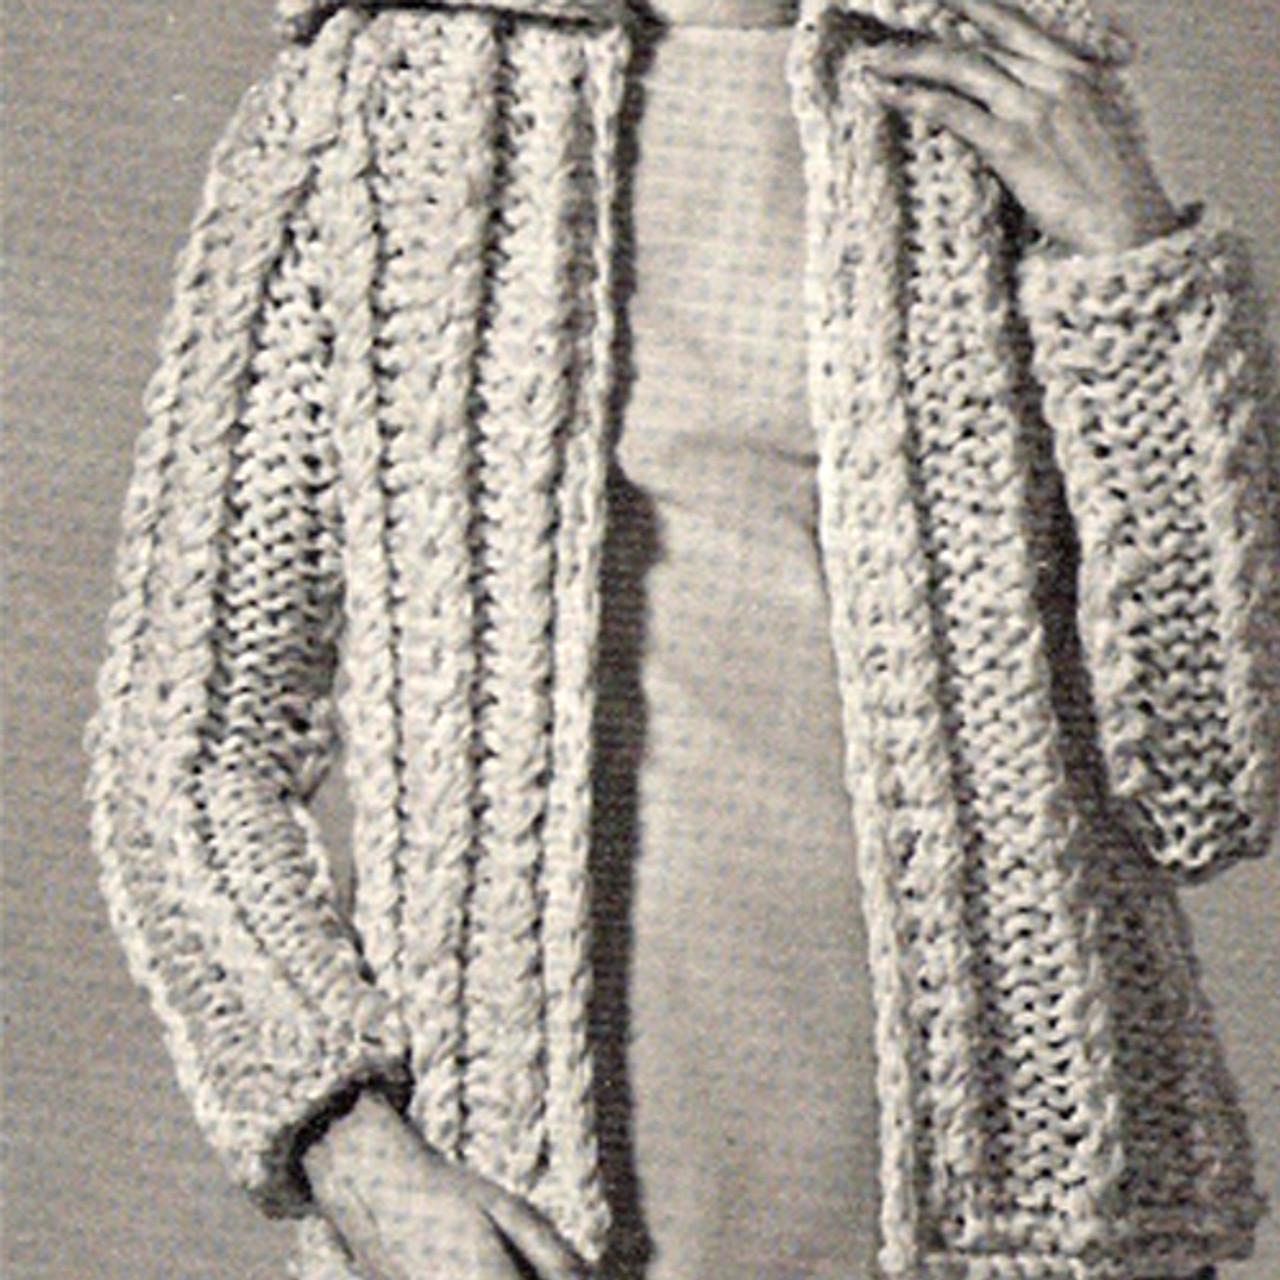 Bulky Knit Cardigan Pattern on Big Needles